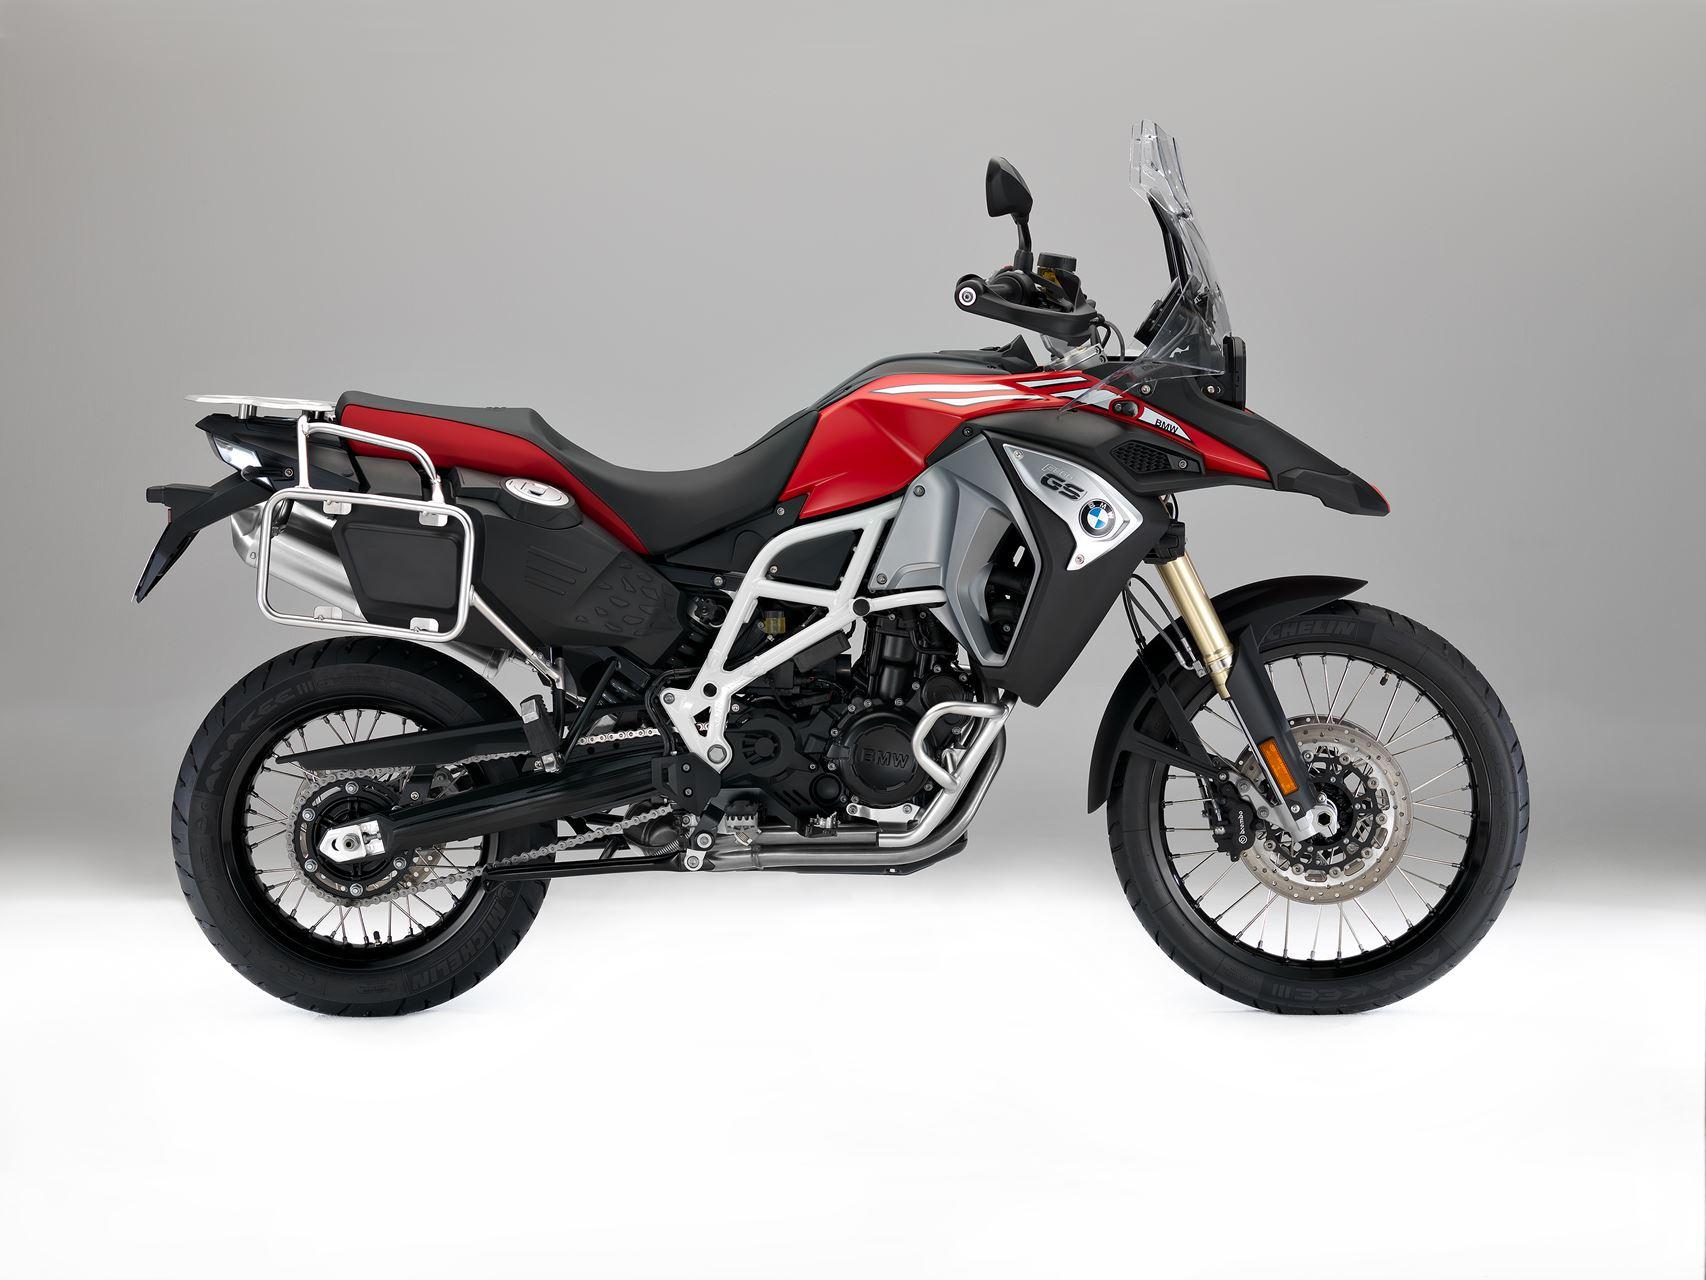 bmw f 800 gs adventure moto adventure andar de moto. Black Bedroom Furniture Sets. Home Design Ideas